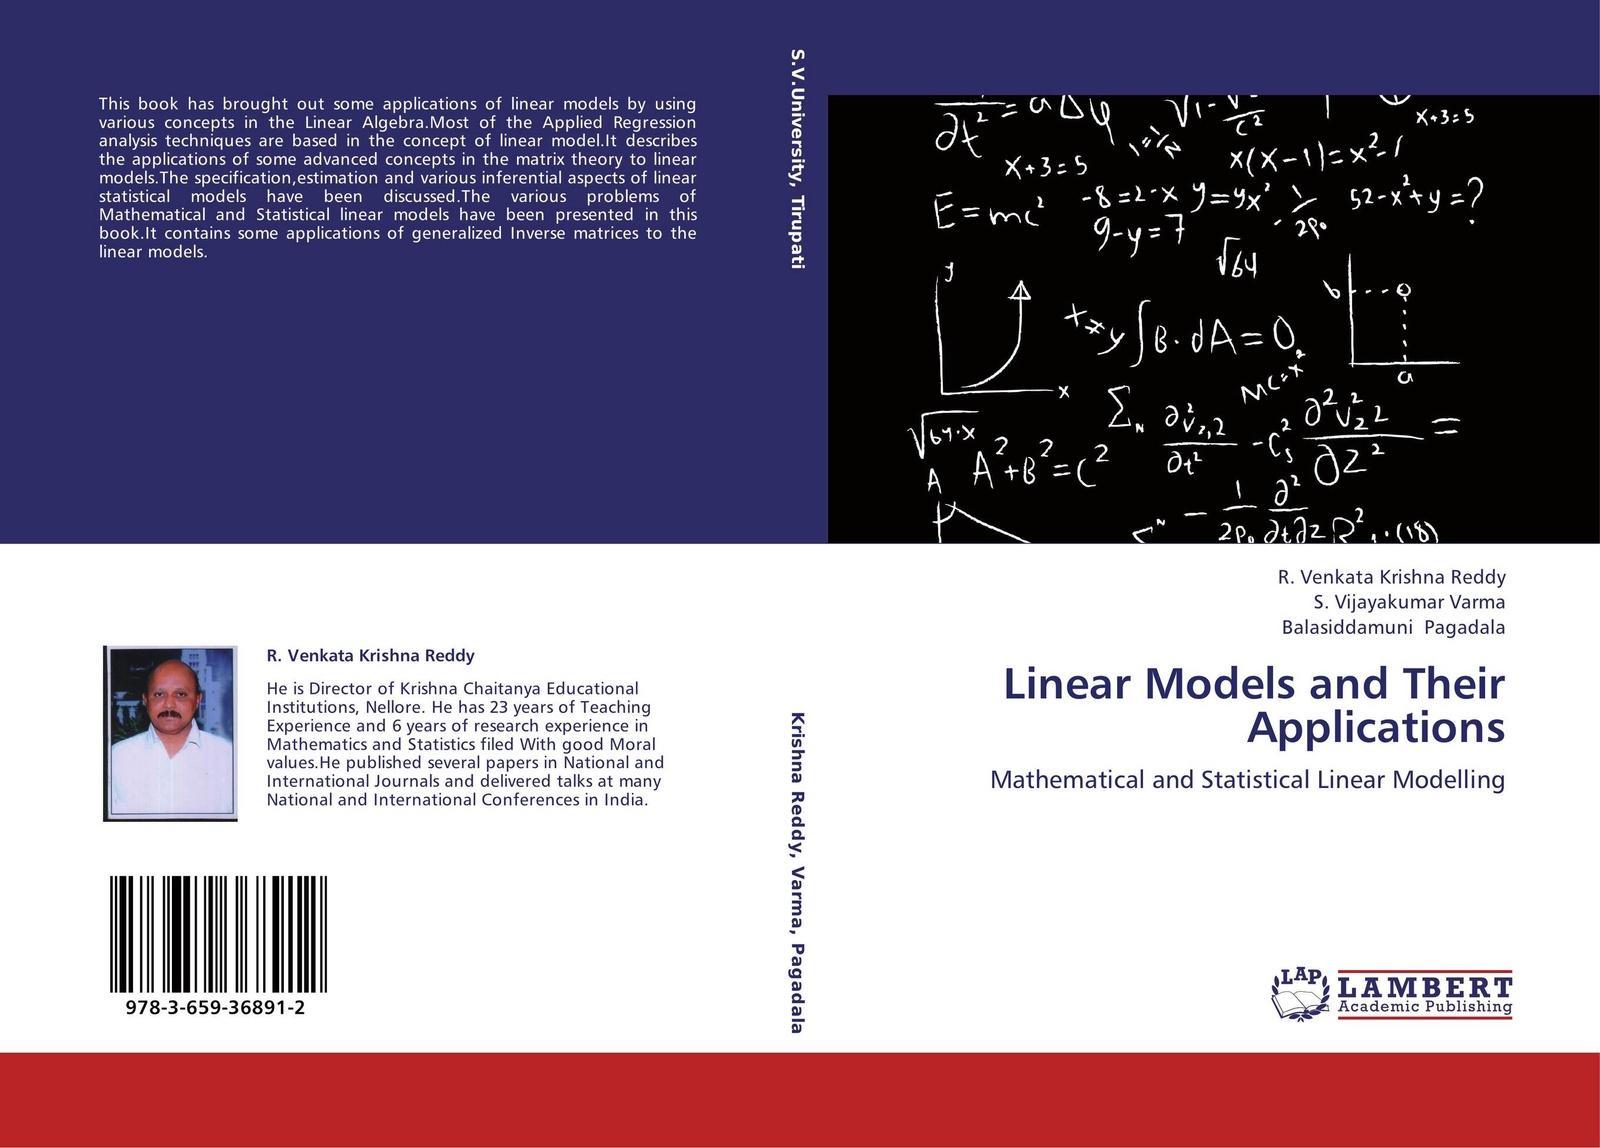 R. Venkata Krishna Reddy,S. Vijayakumar Varma and Balasiddamuni Pagadala Linear Models and Their Applications